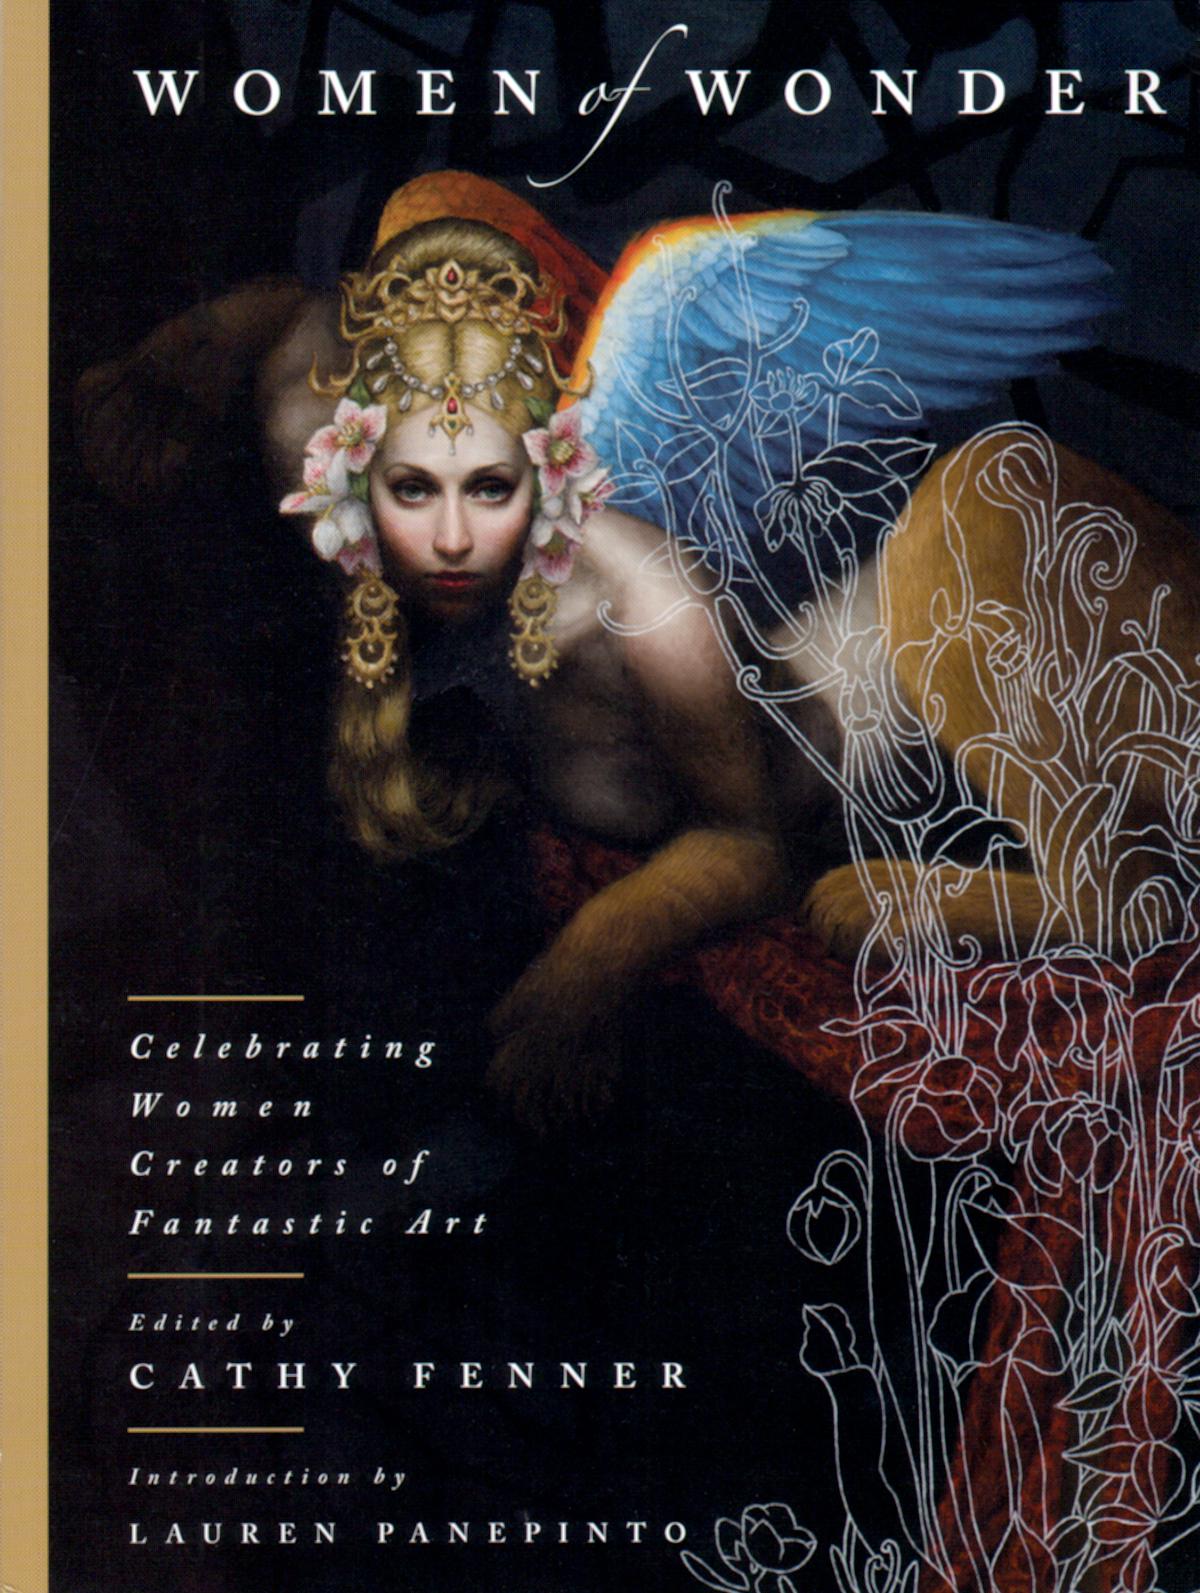 """Women of Wonder - Celebrating Women Creators of Fantastic Art"" edited by Cathy Fenner."